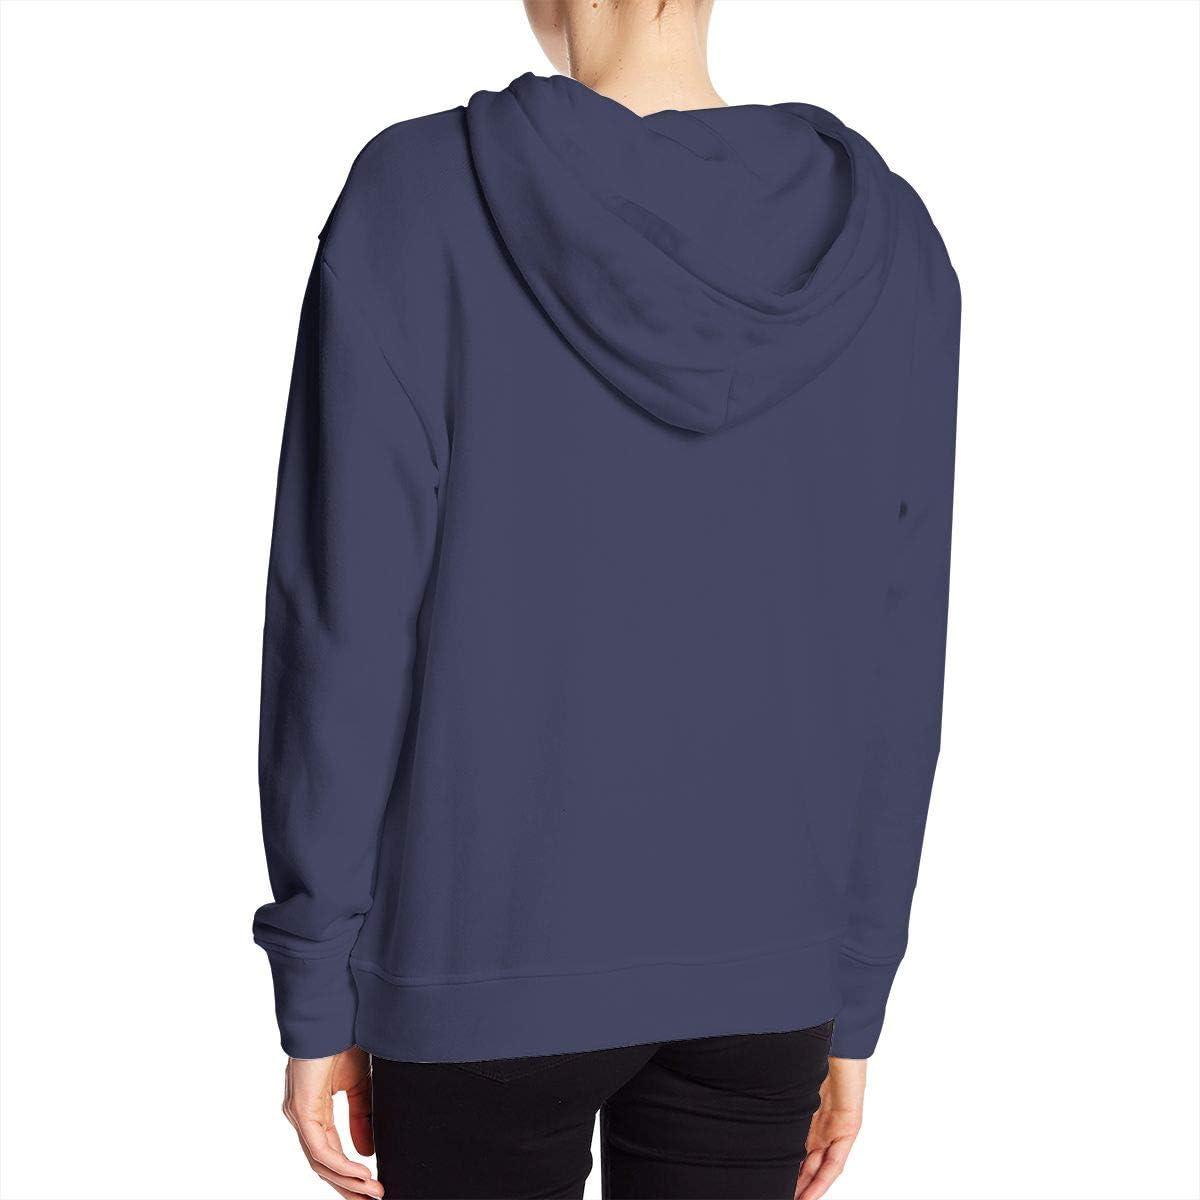 HELLONICE Harley Davidson Logo Womens Fashion Pocket Hooded Sweatshirt